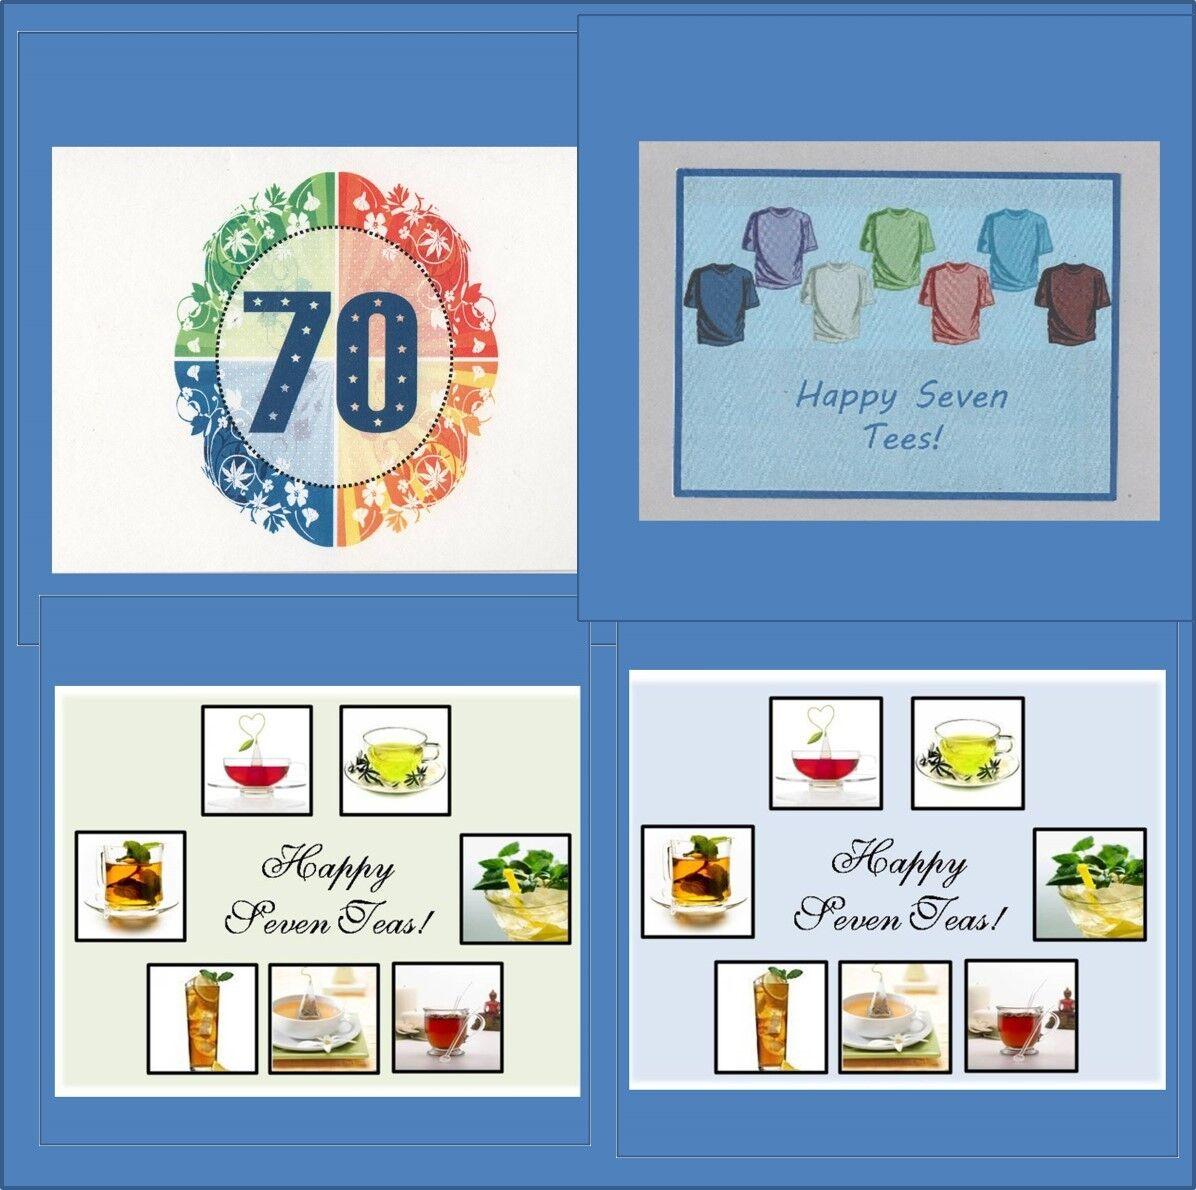 Handmade 70th Birthday Cards Milestone Card Free Shipping In Usa Ebay